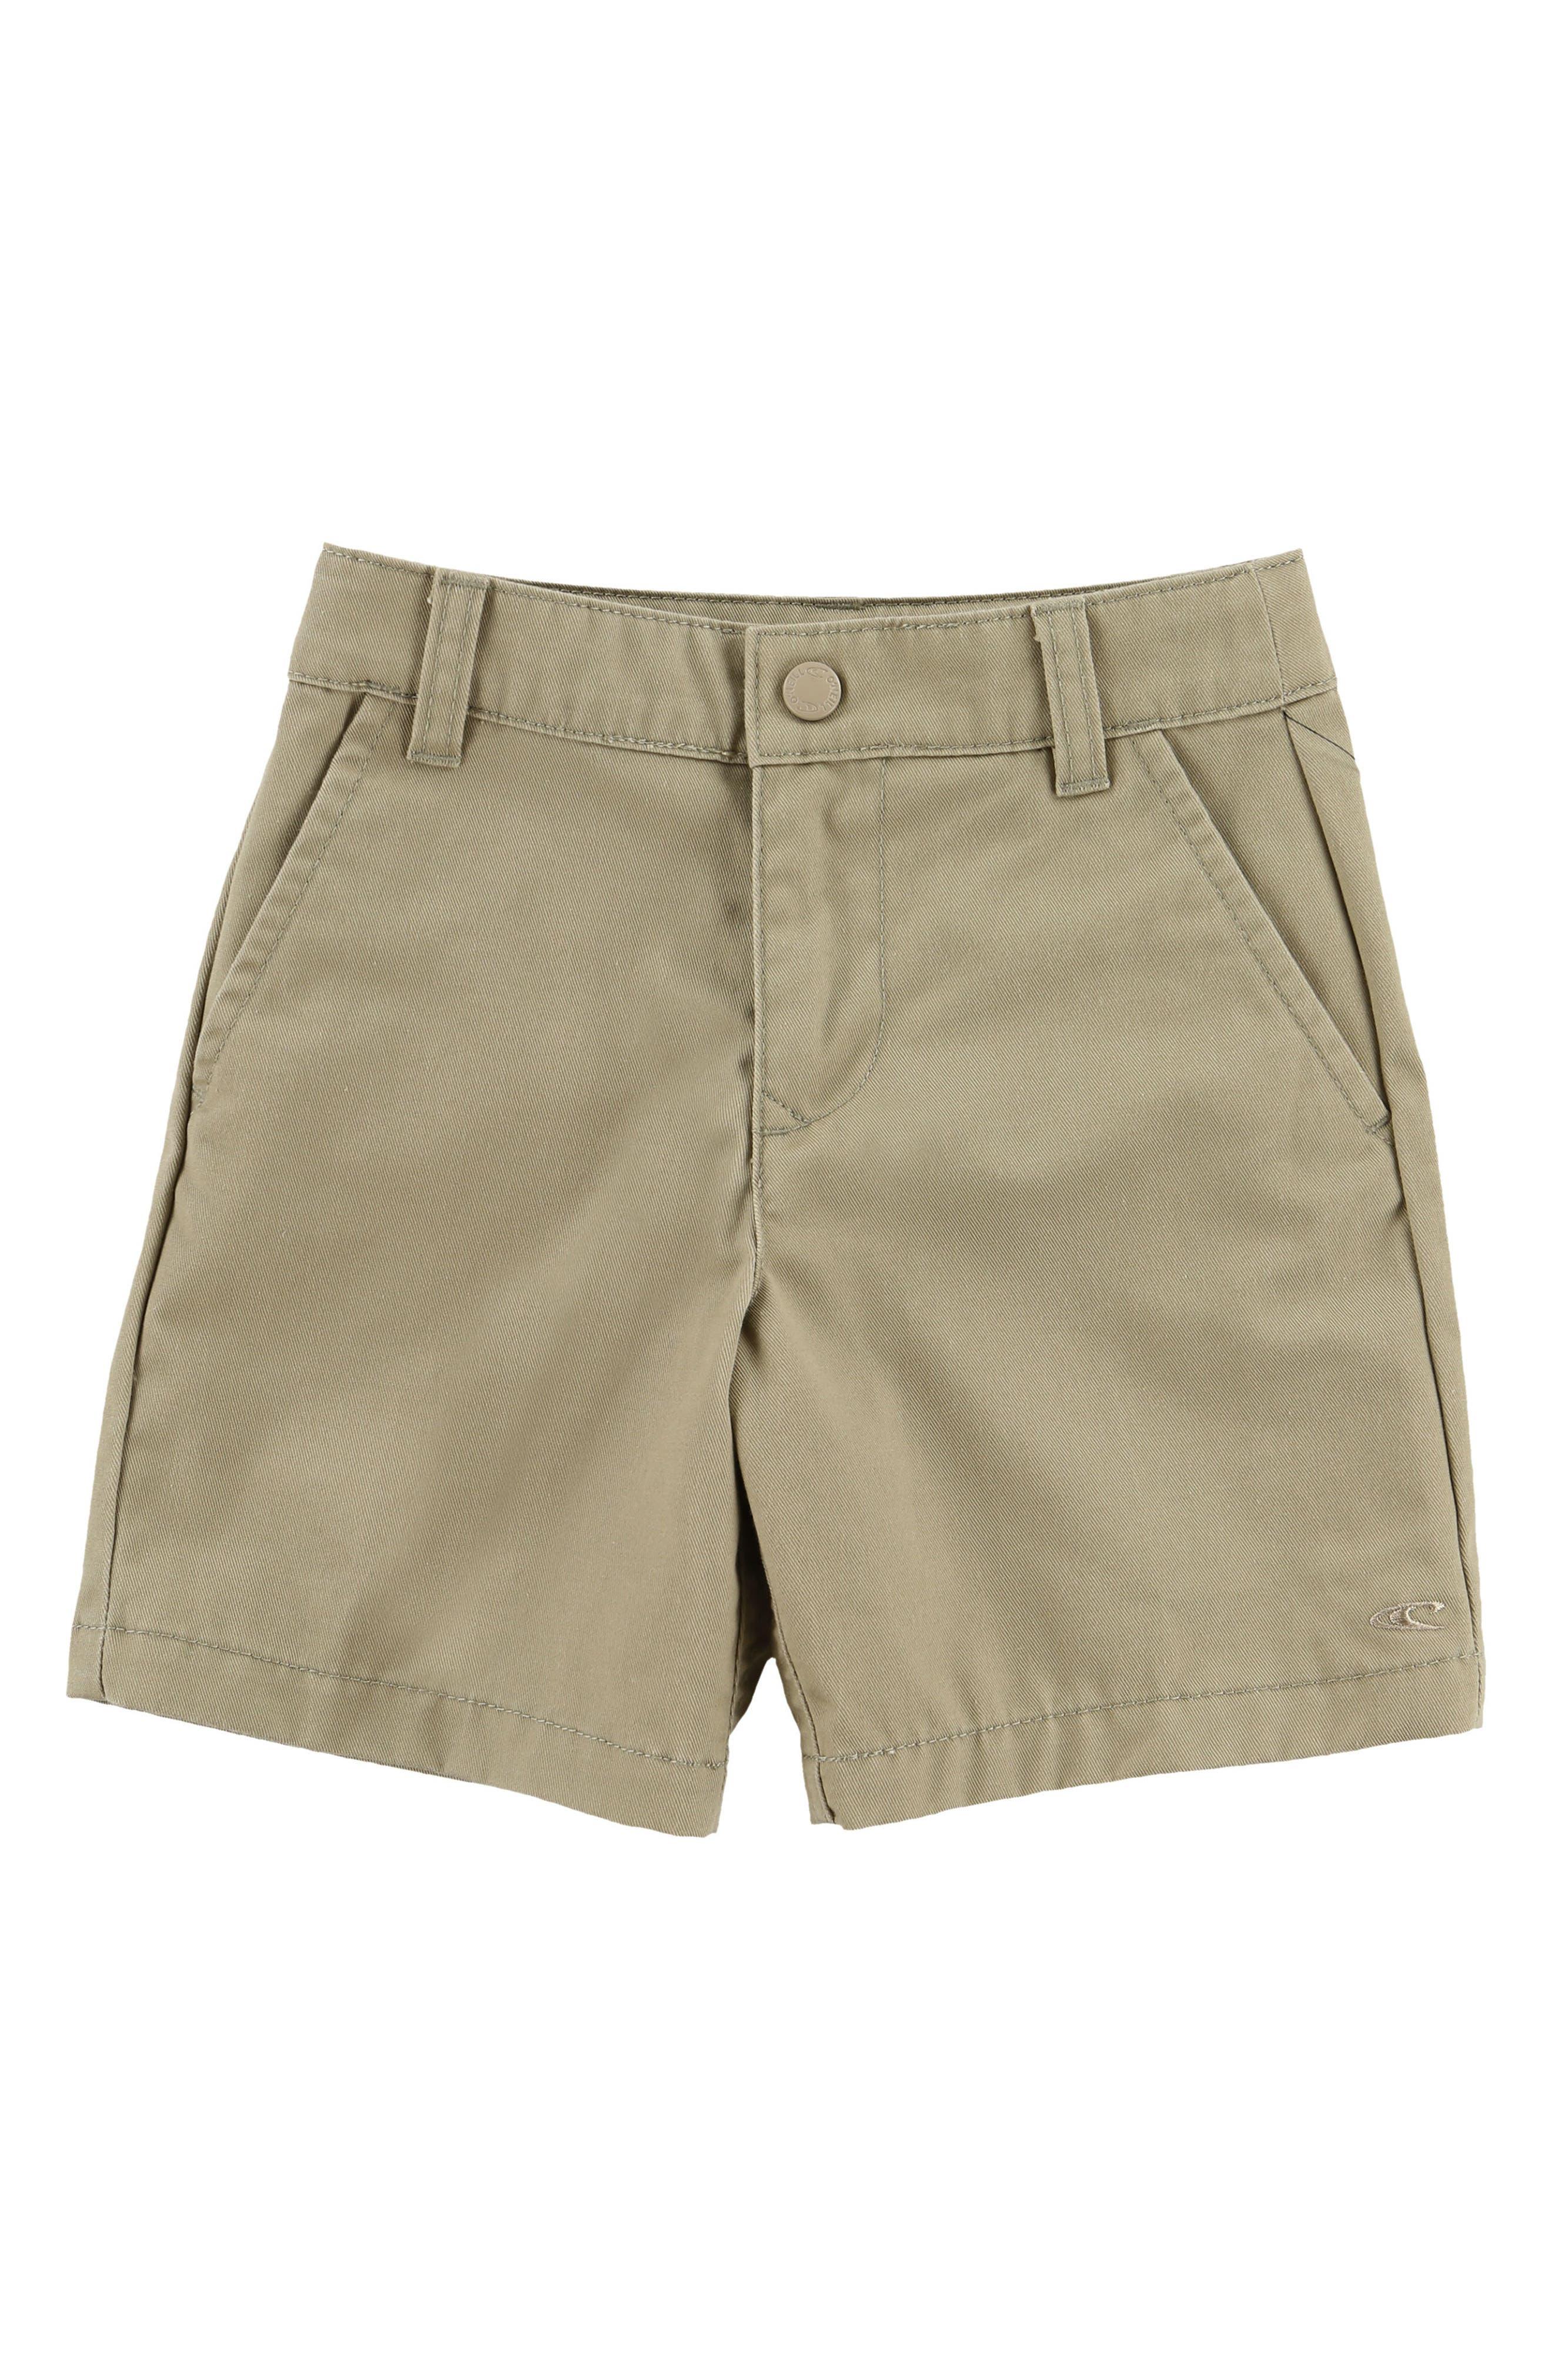 Contact Twill Walking Shorts,                         Main,                         color, Oneill Kha